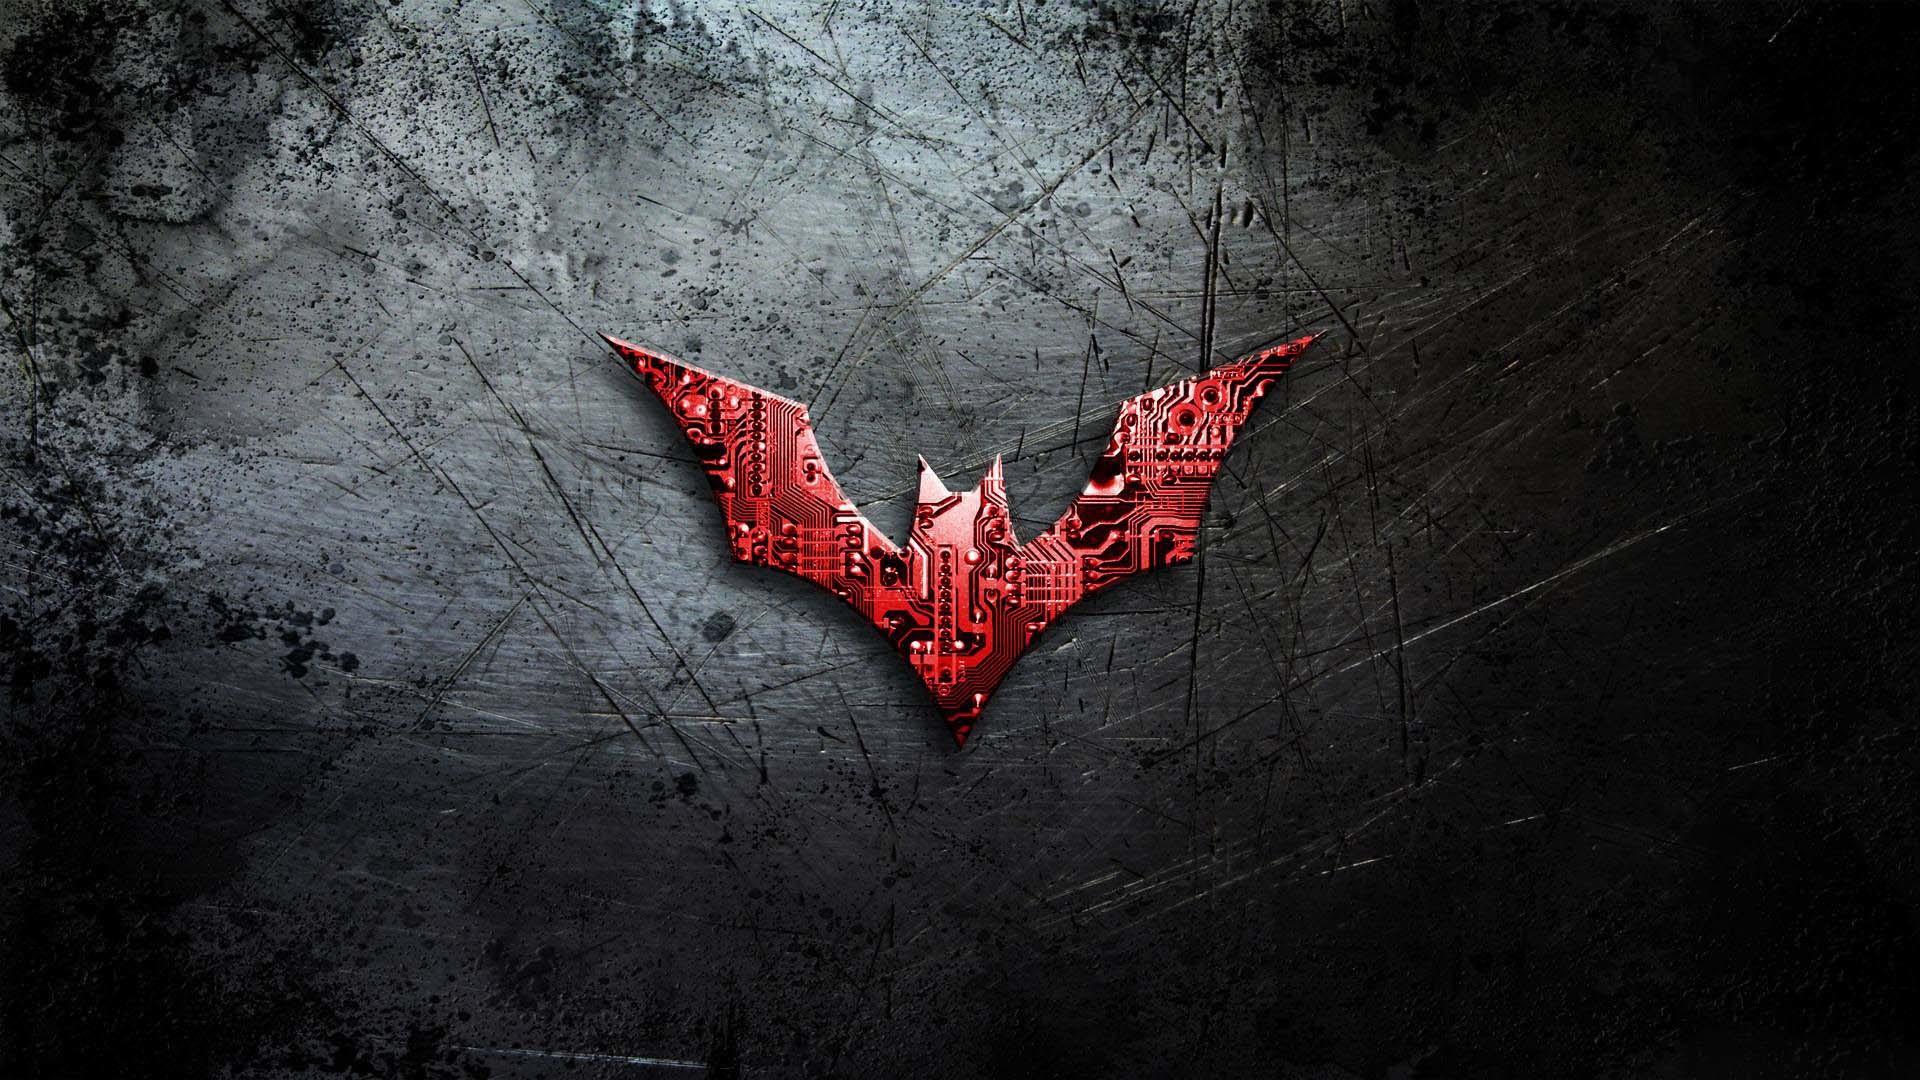 Batman Beyond Desktop Background Wallpapers HD Wallpaper Site Batman HD  Wallpapers For Desktop Wallpapers)